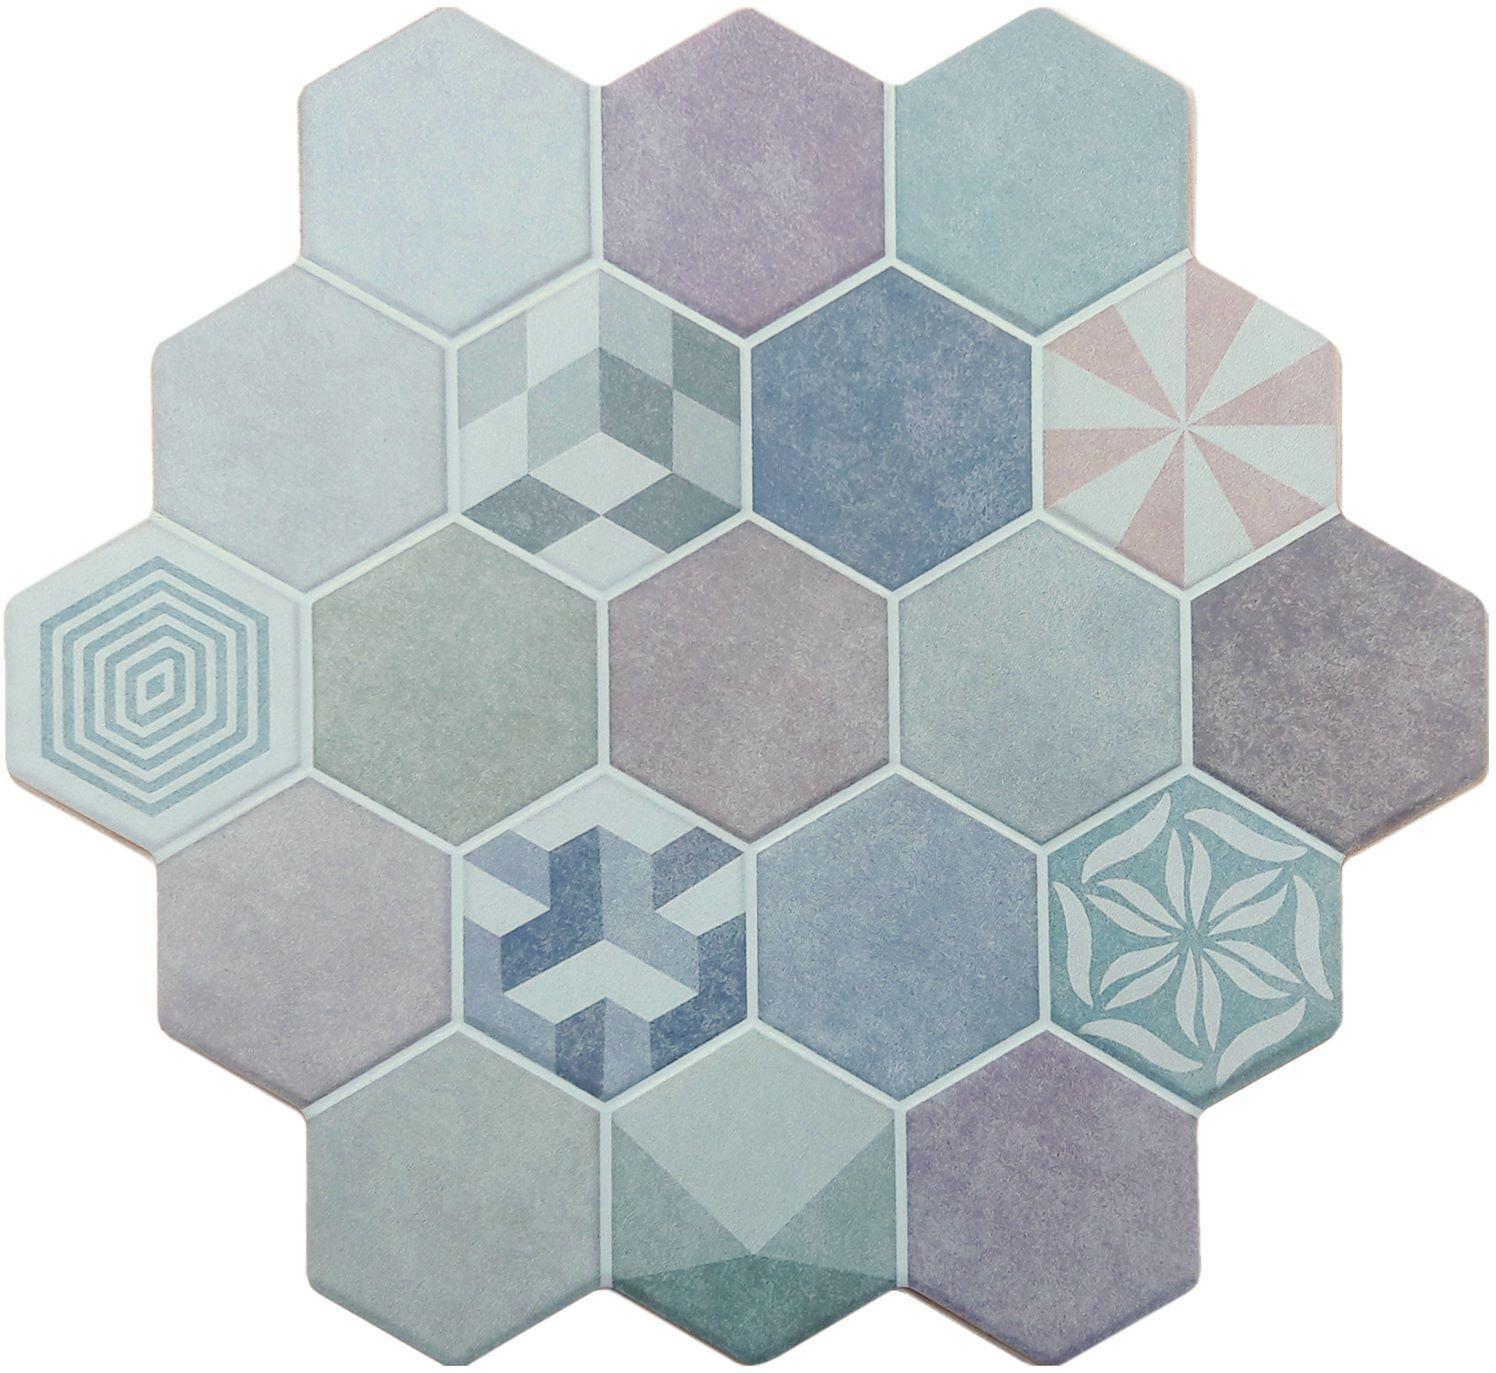 Bathroom tile / wall / ceramic / geometric pattern - COMBINE ...